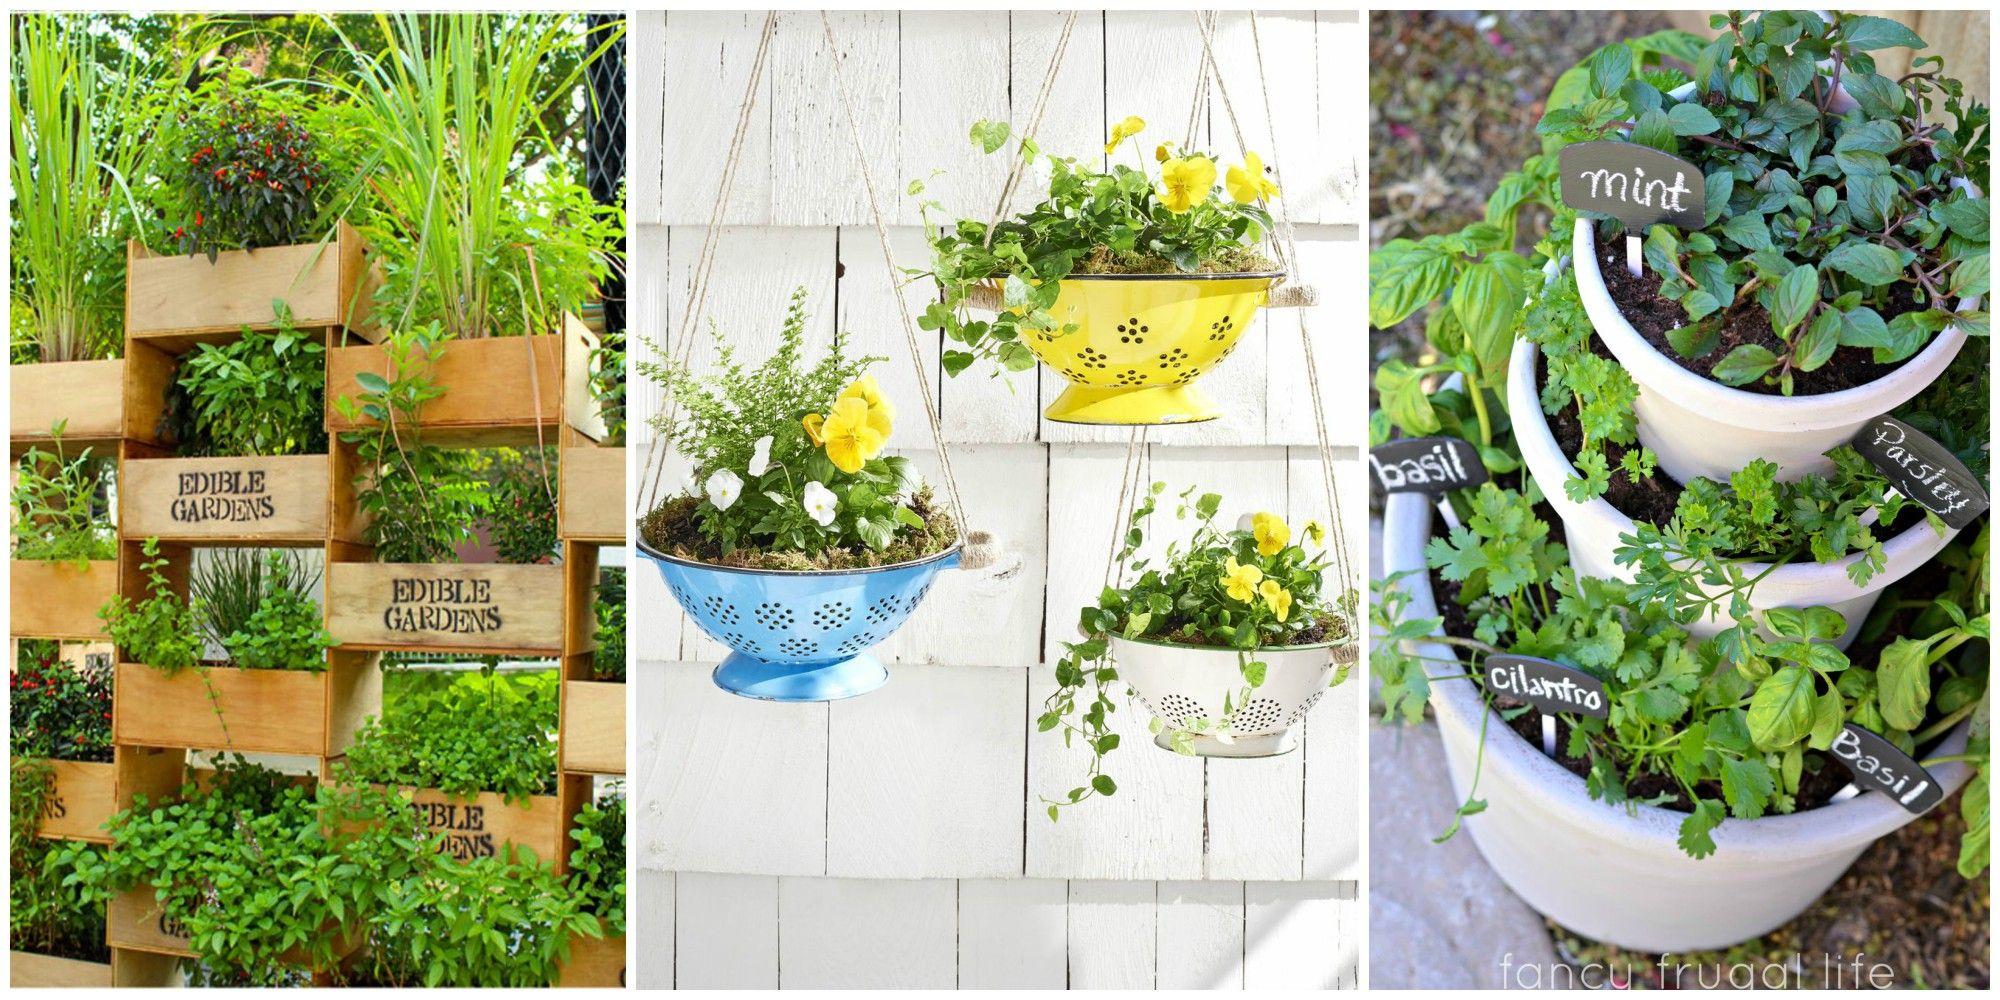 28 Small Backyard Ideas - Beautiful Landscaping Designs ... on Diy Back Garden Ideas  id=57733